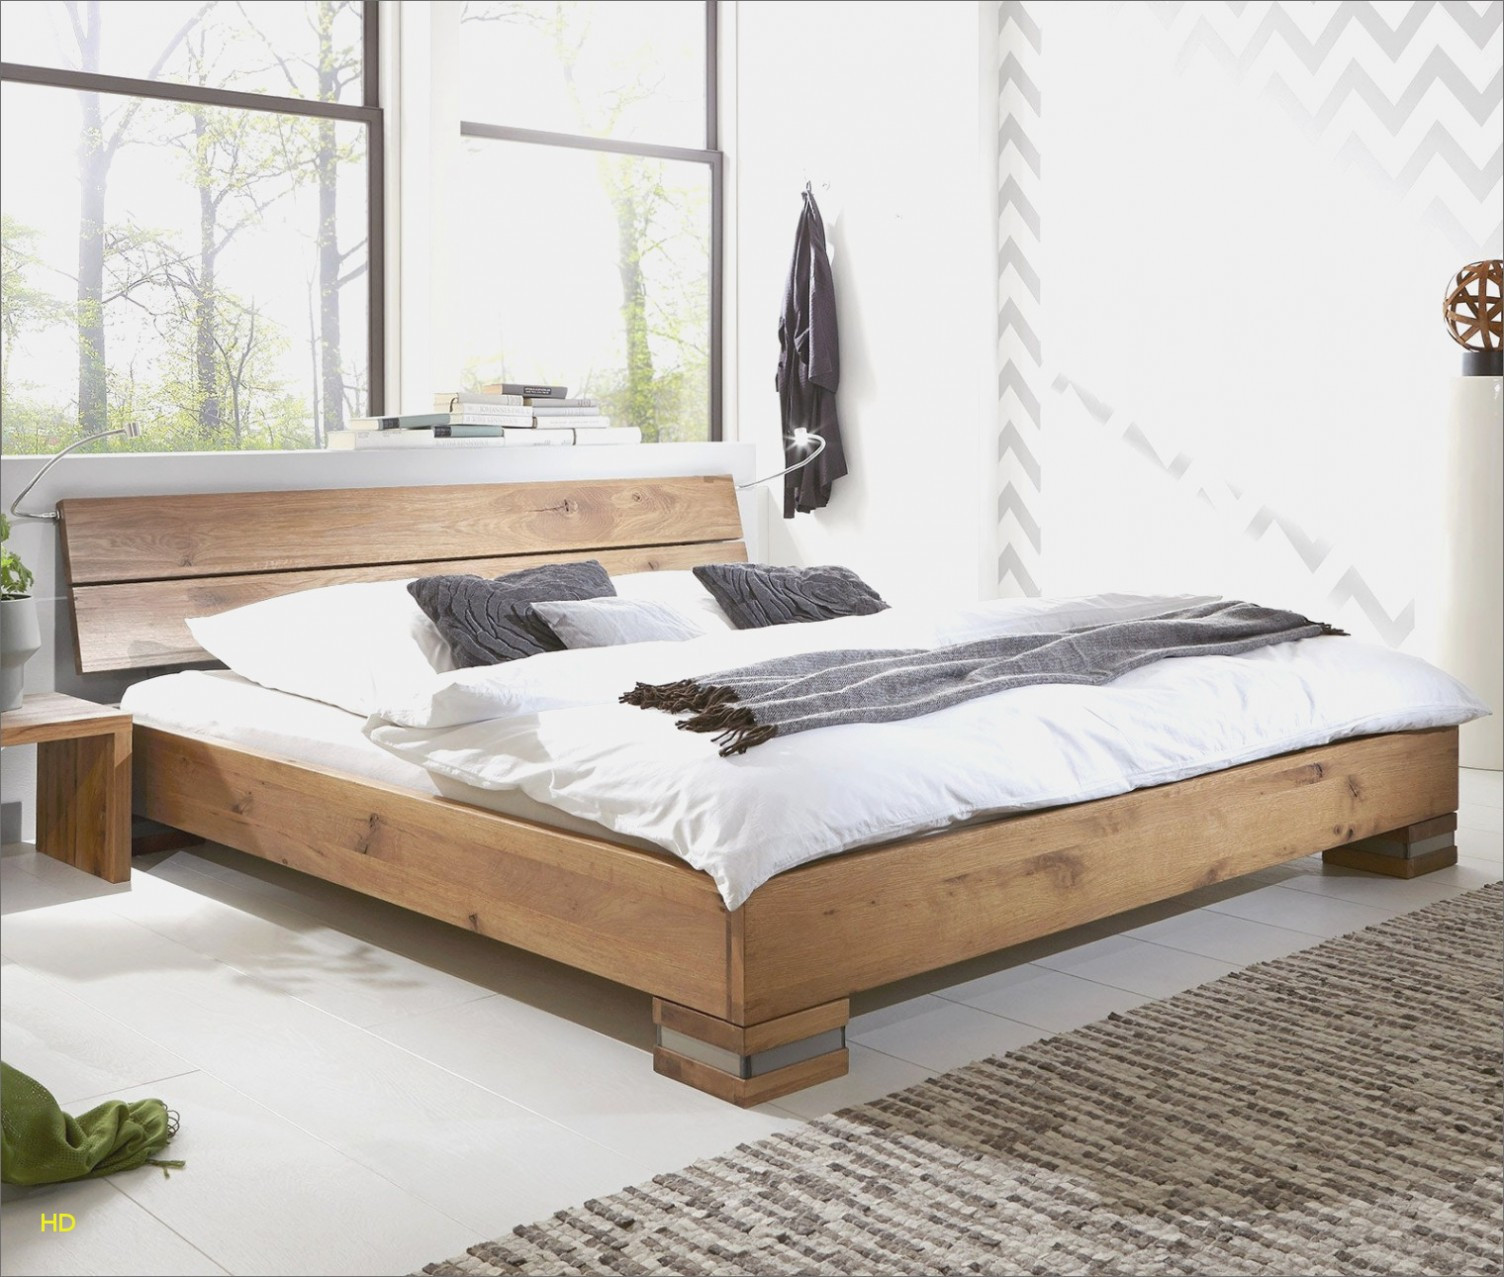 Full Size of Ausziehbares Doppelbett Bett Ausziehbar Vk Anleitung Beste Mbelideen Wohnzimmer Ausziehbares Doppelbett